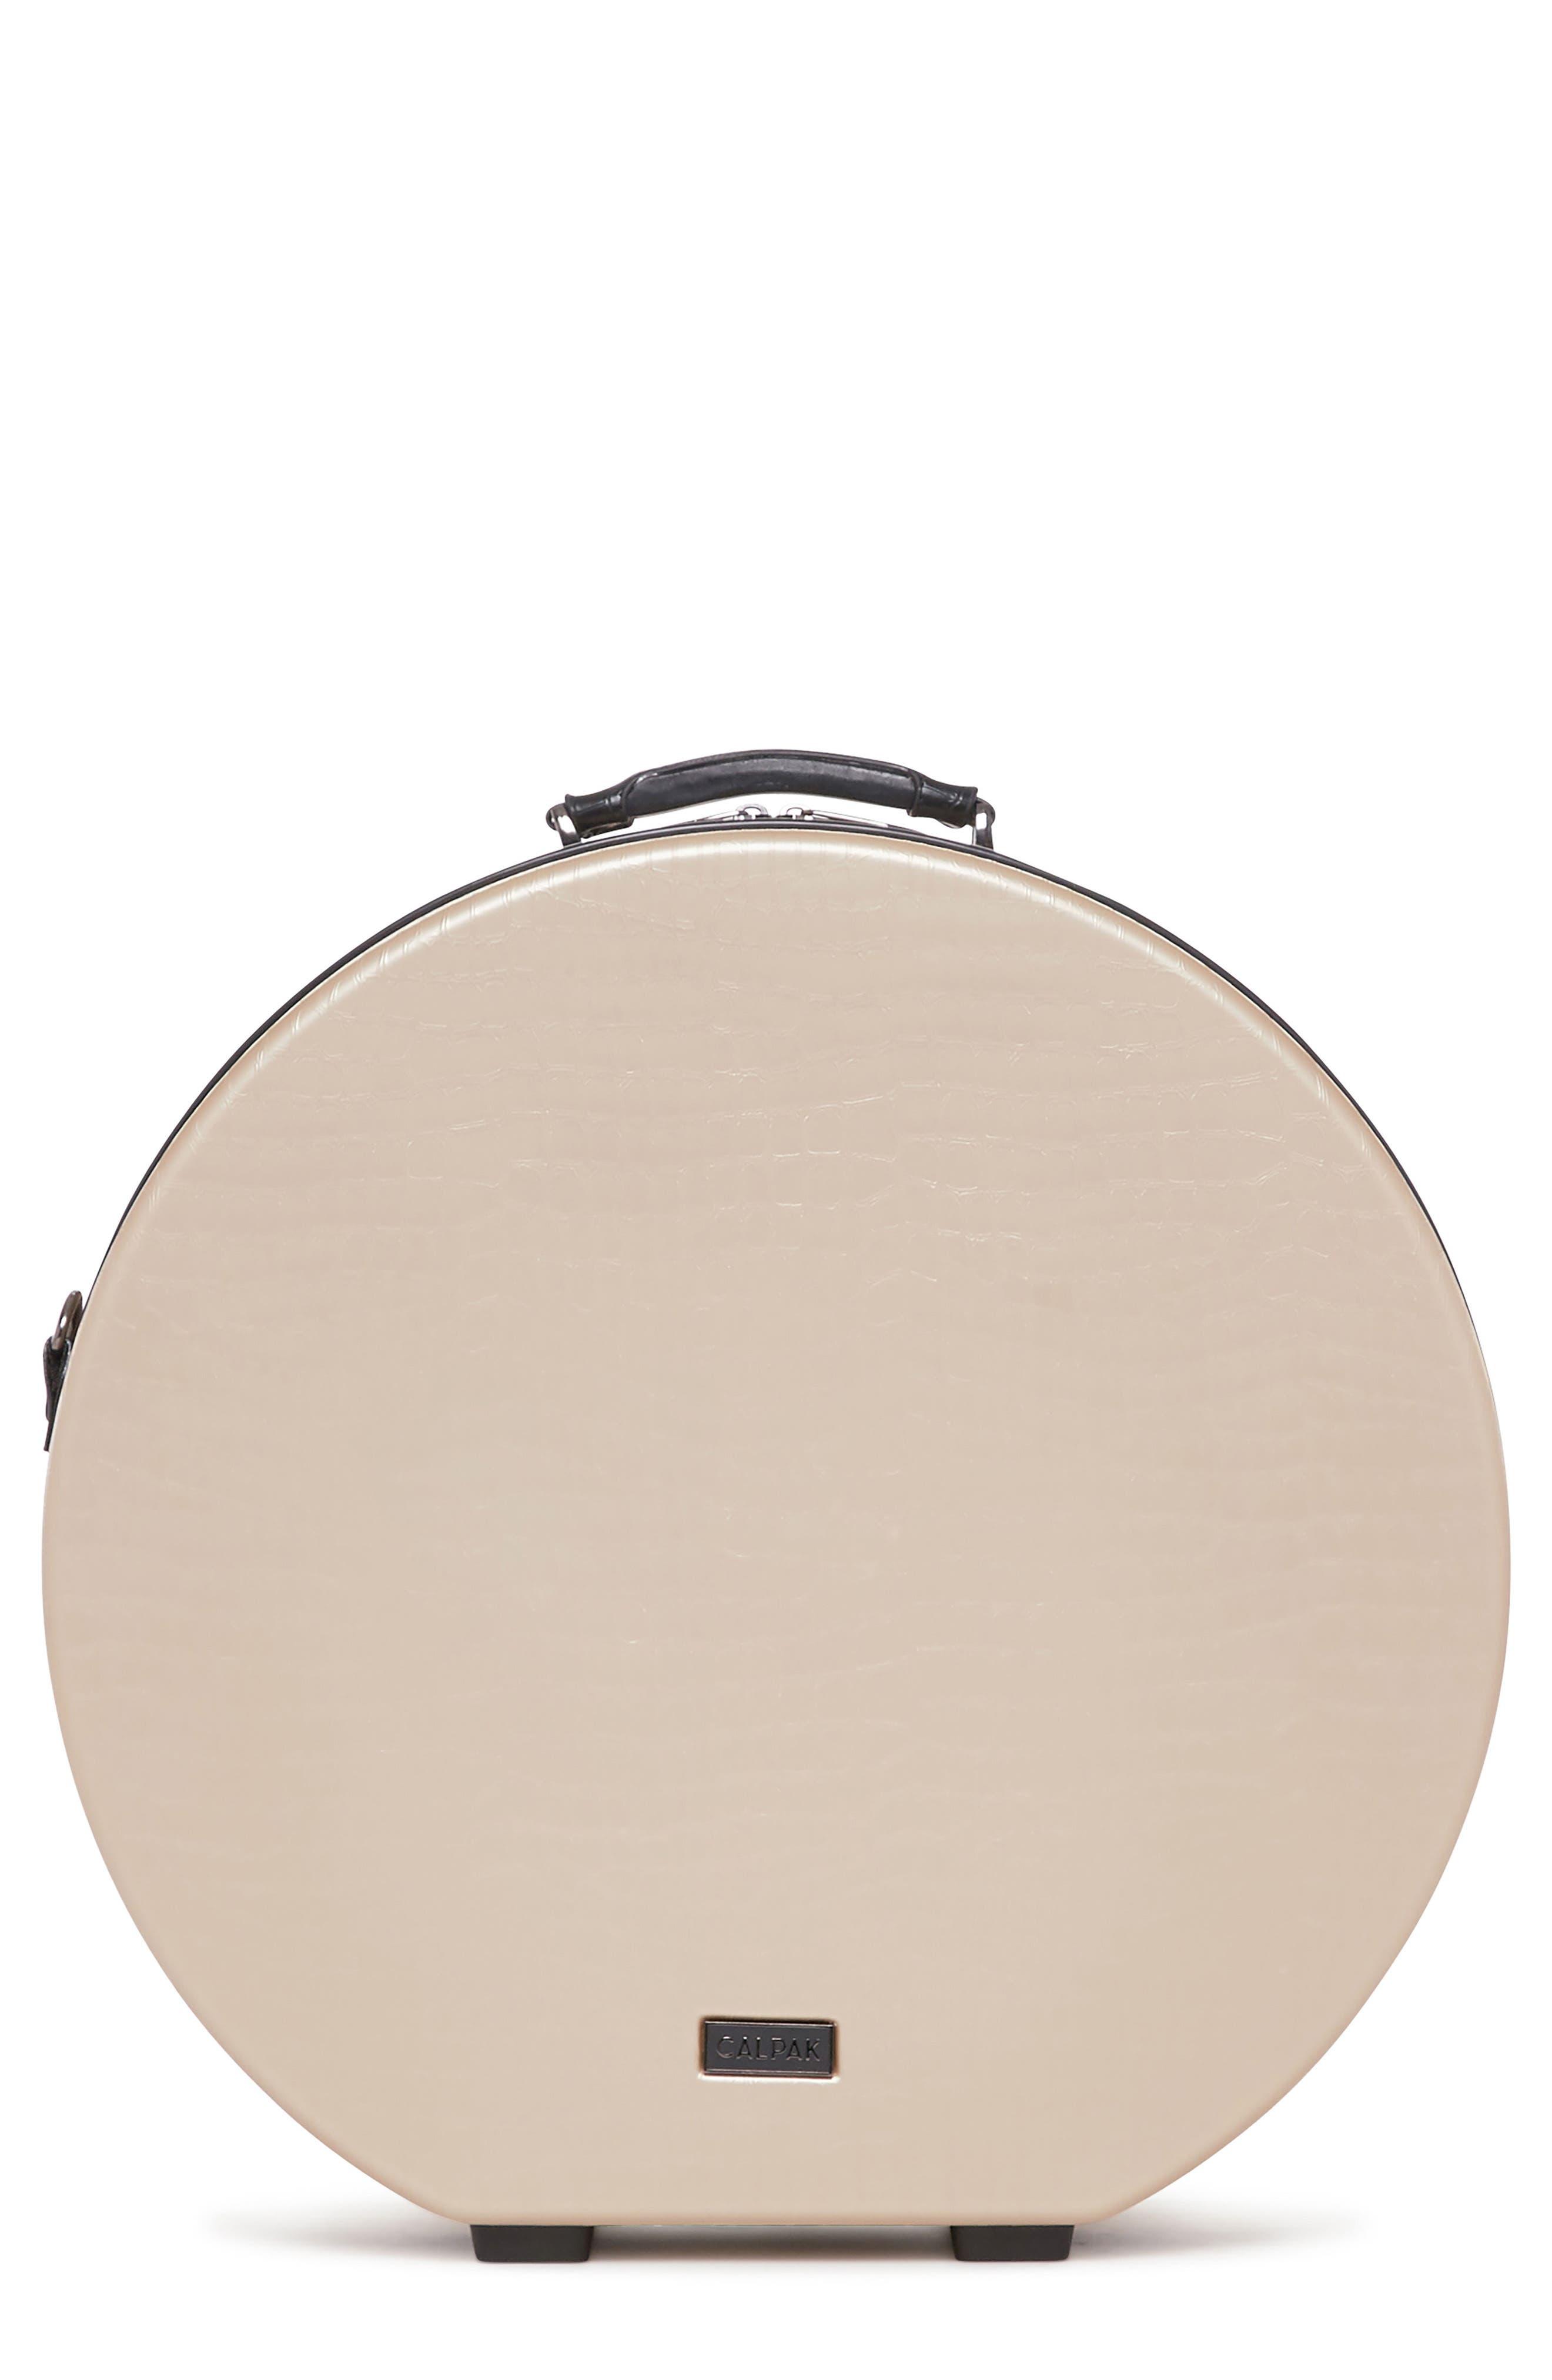 CALPAK Baye Large Hardcase Hat Box